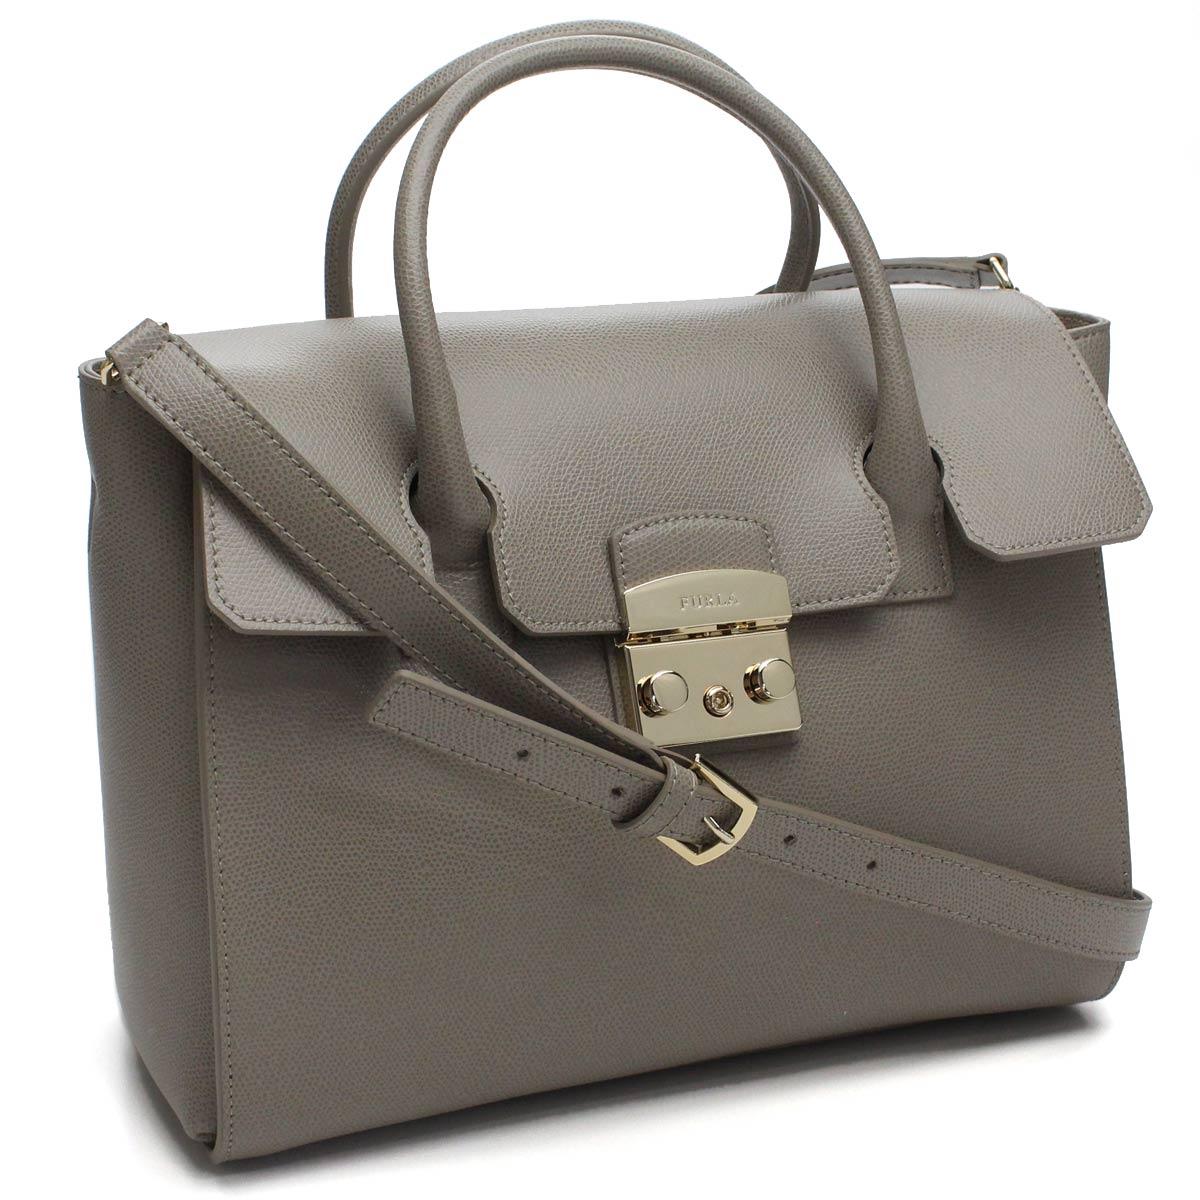 3977f5ef6e70 Bighit The total brand wholesale: Full lah (FURLA) METROPOLIS M SATCHEL  metropolis M Satchell 2way tote bag BGZ8 851186 ARE SBB SABBIA gray system  | Rakuten ...